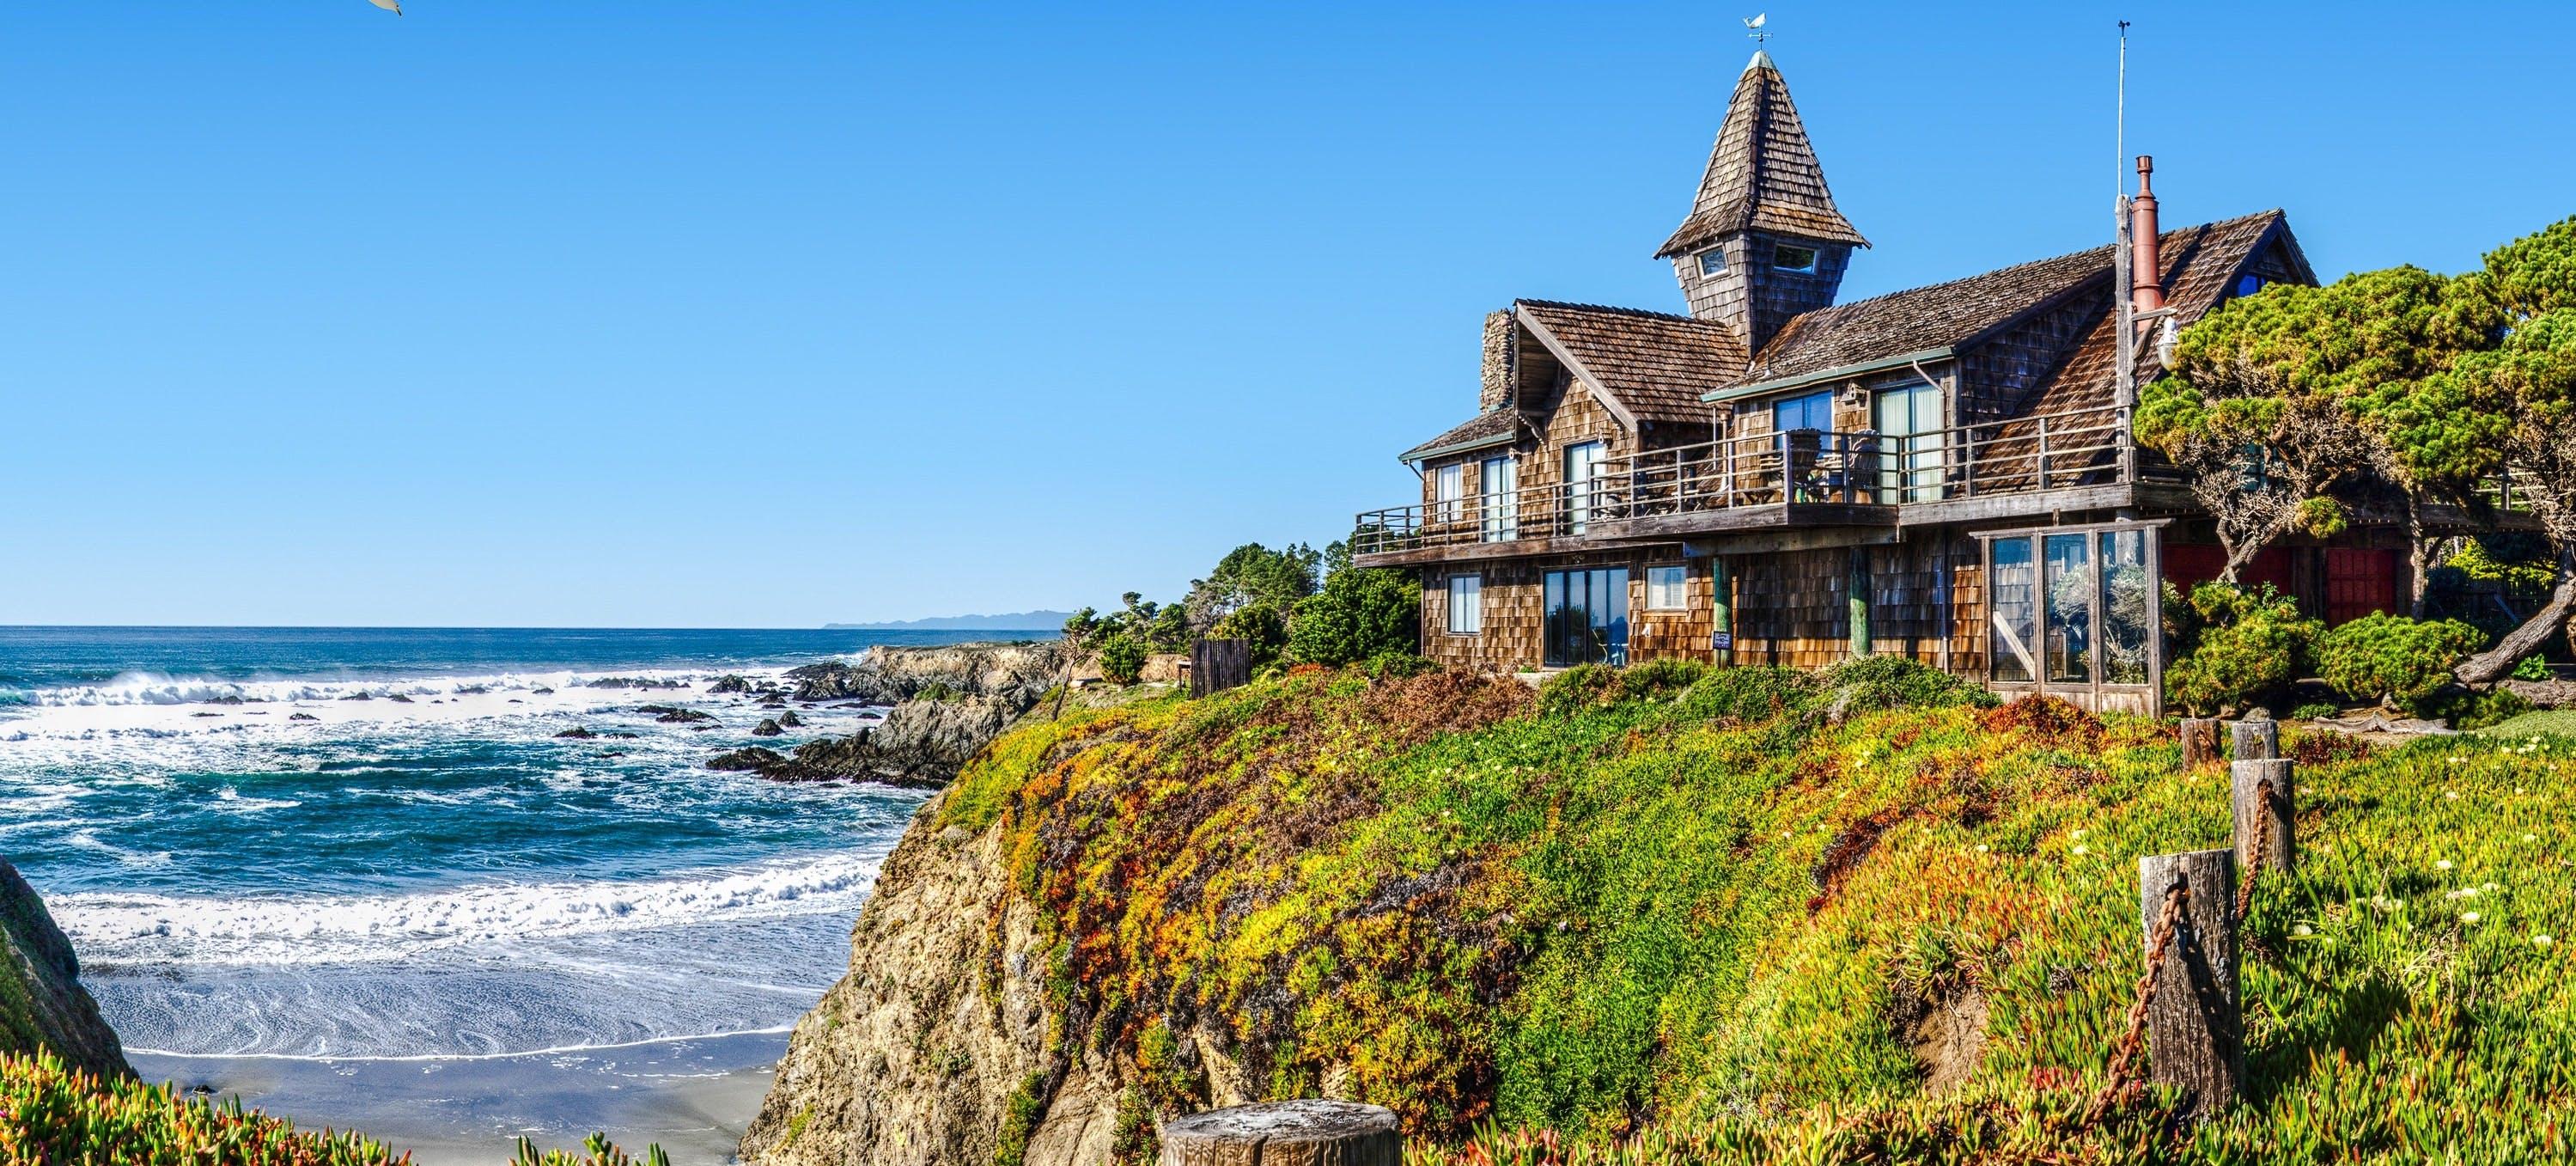 Fort Bragg, CA Cliffside Beach House Vacation Rental